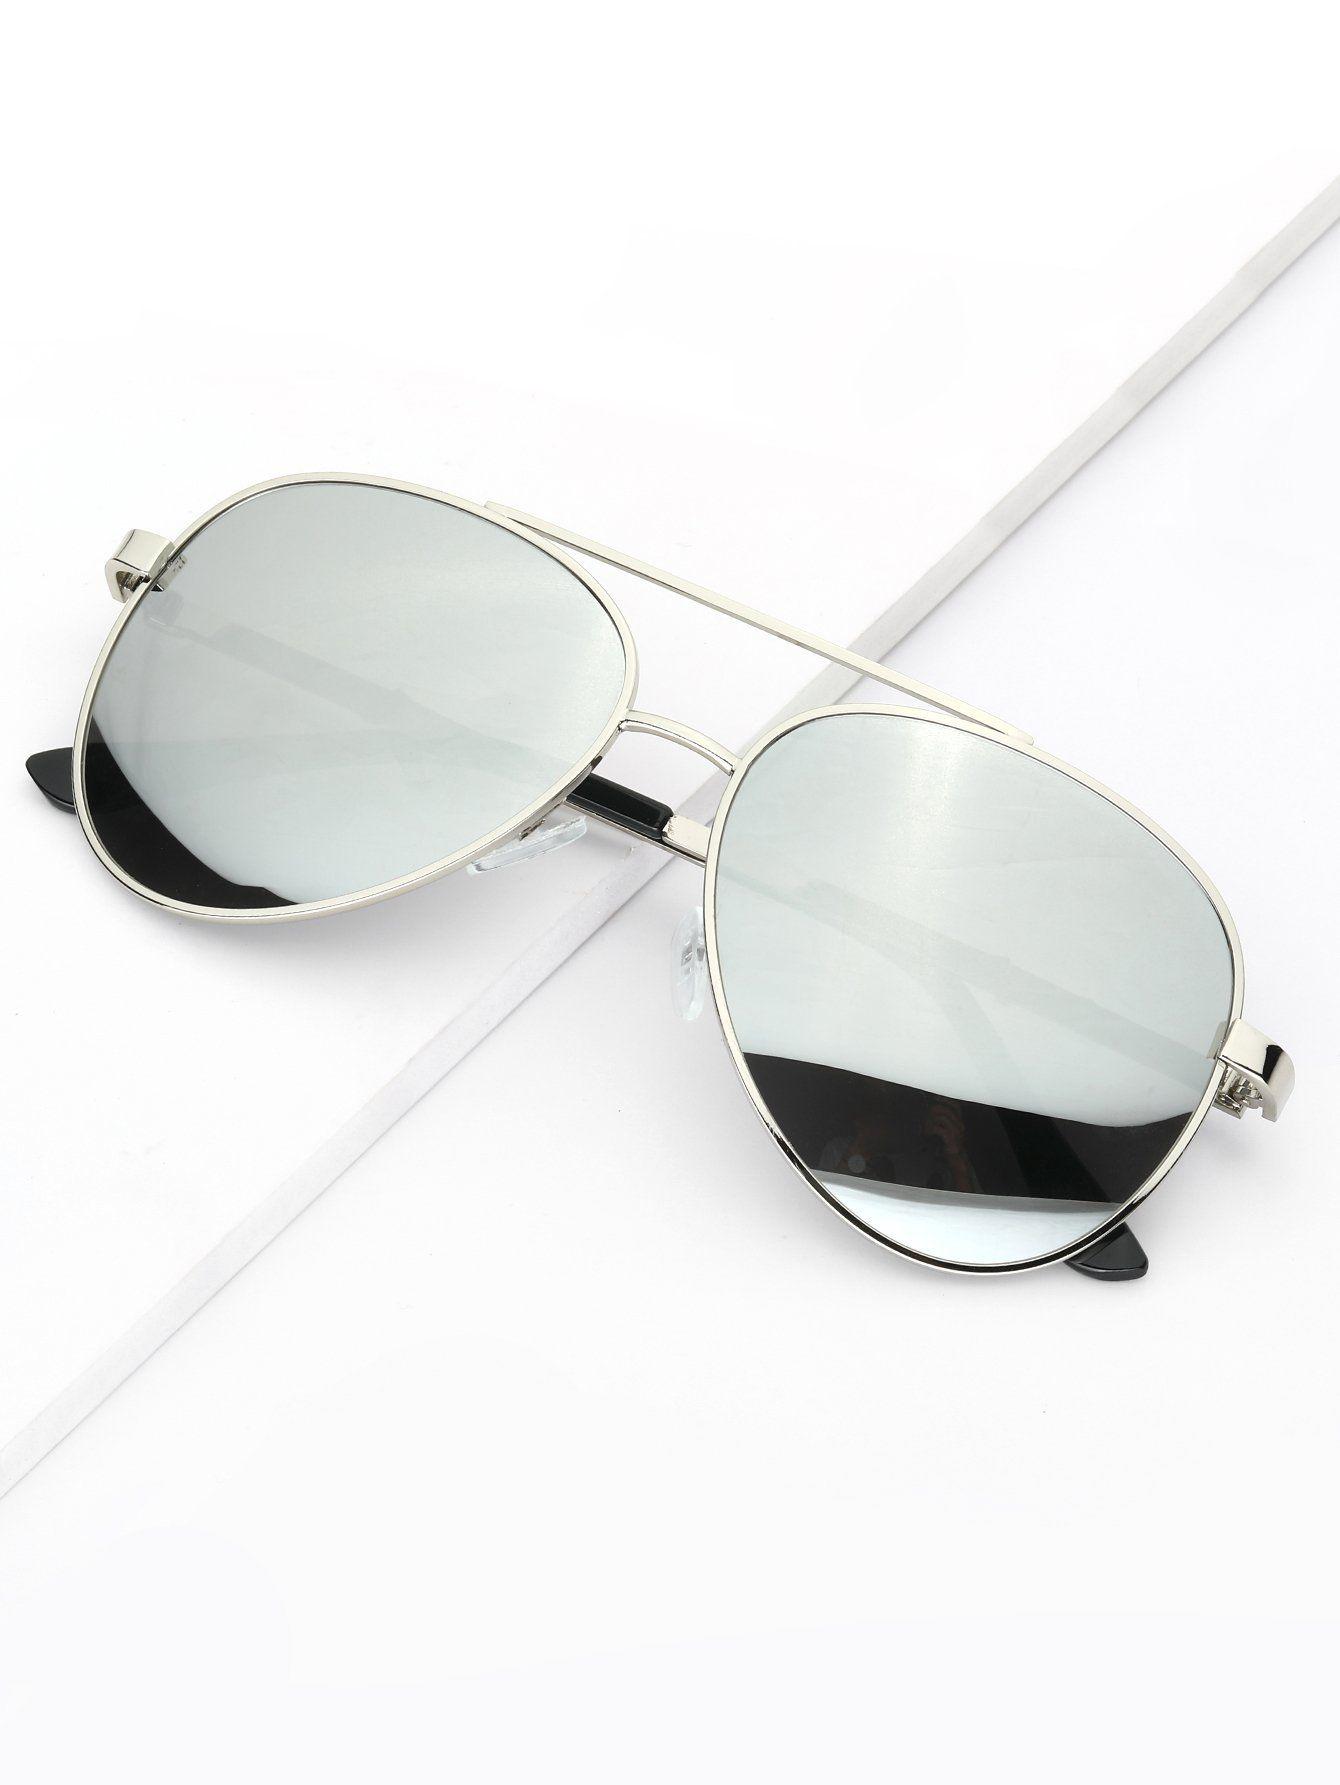 01cbdd627a Men's Silver Metal Frame & Silver Mirror Lens Aviator Sunglasses FREE SHIP